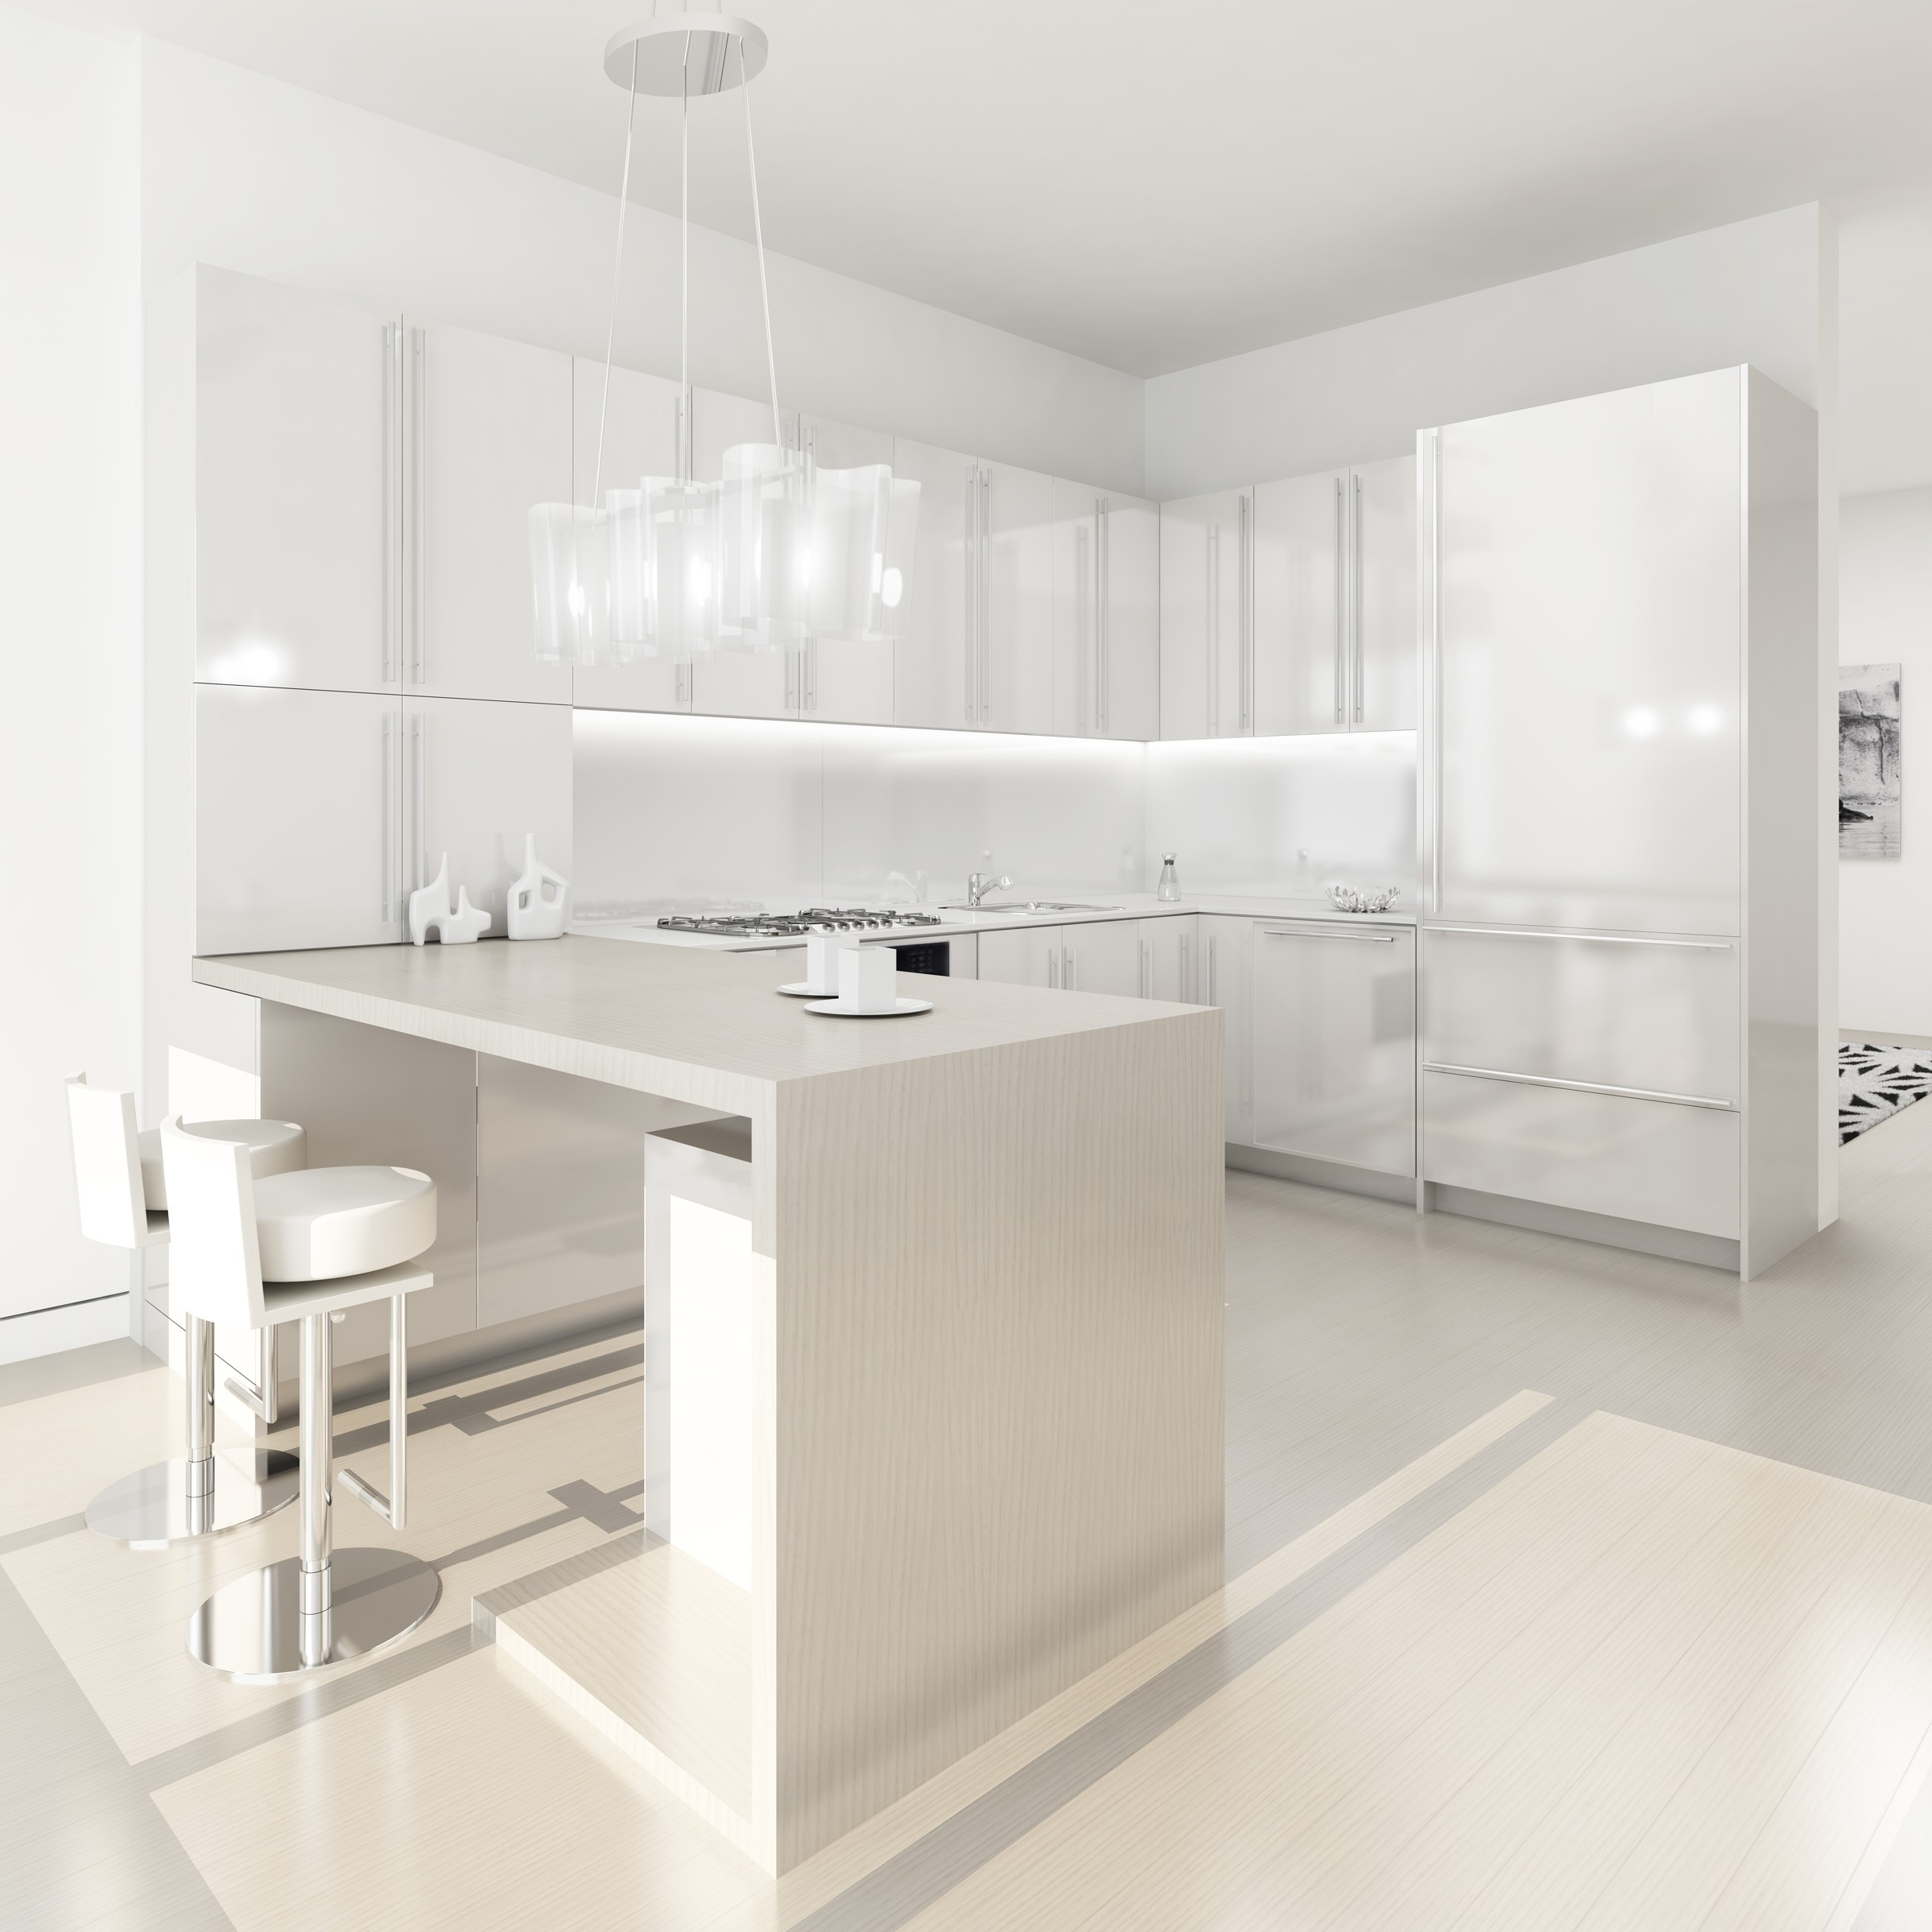 white kitchens white kitchen designs Via apartment therapy